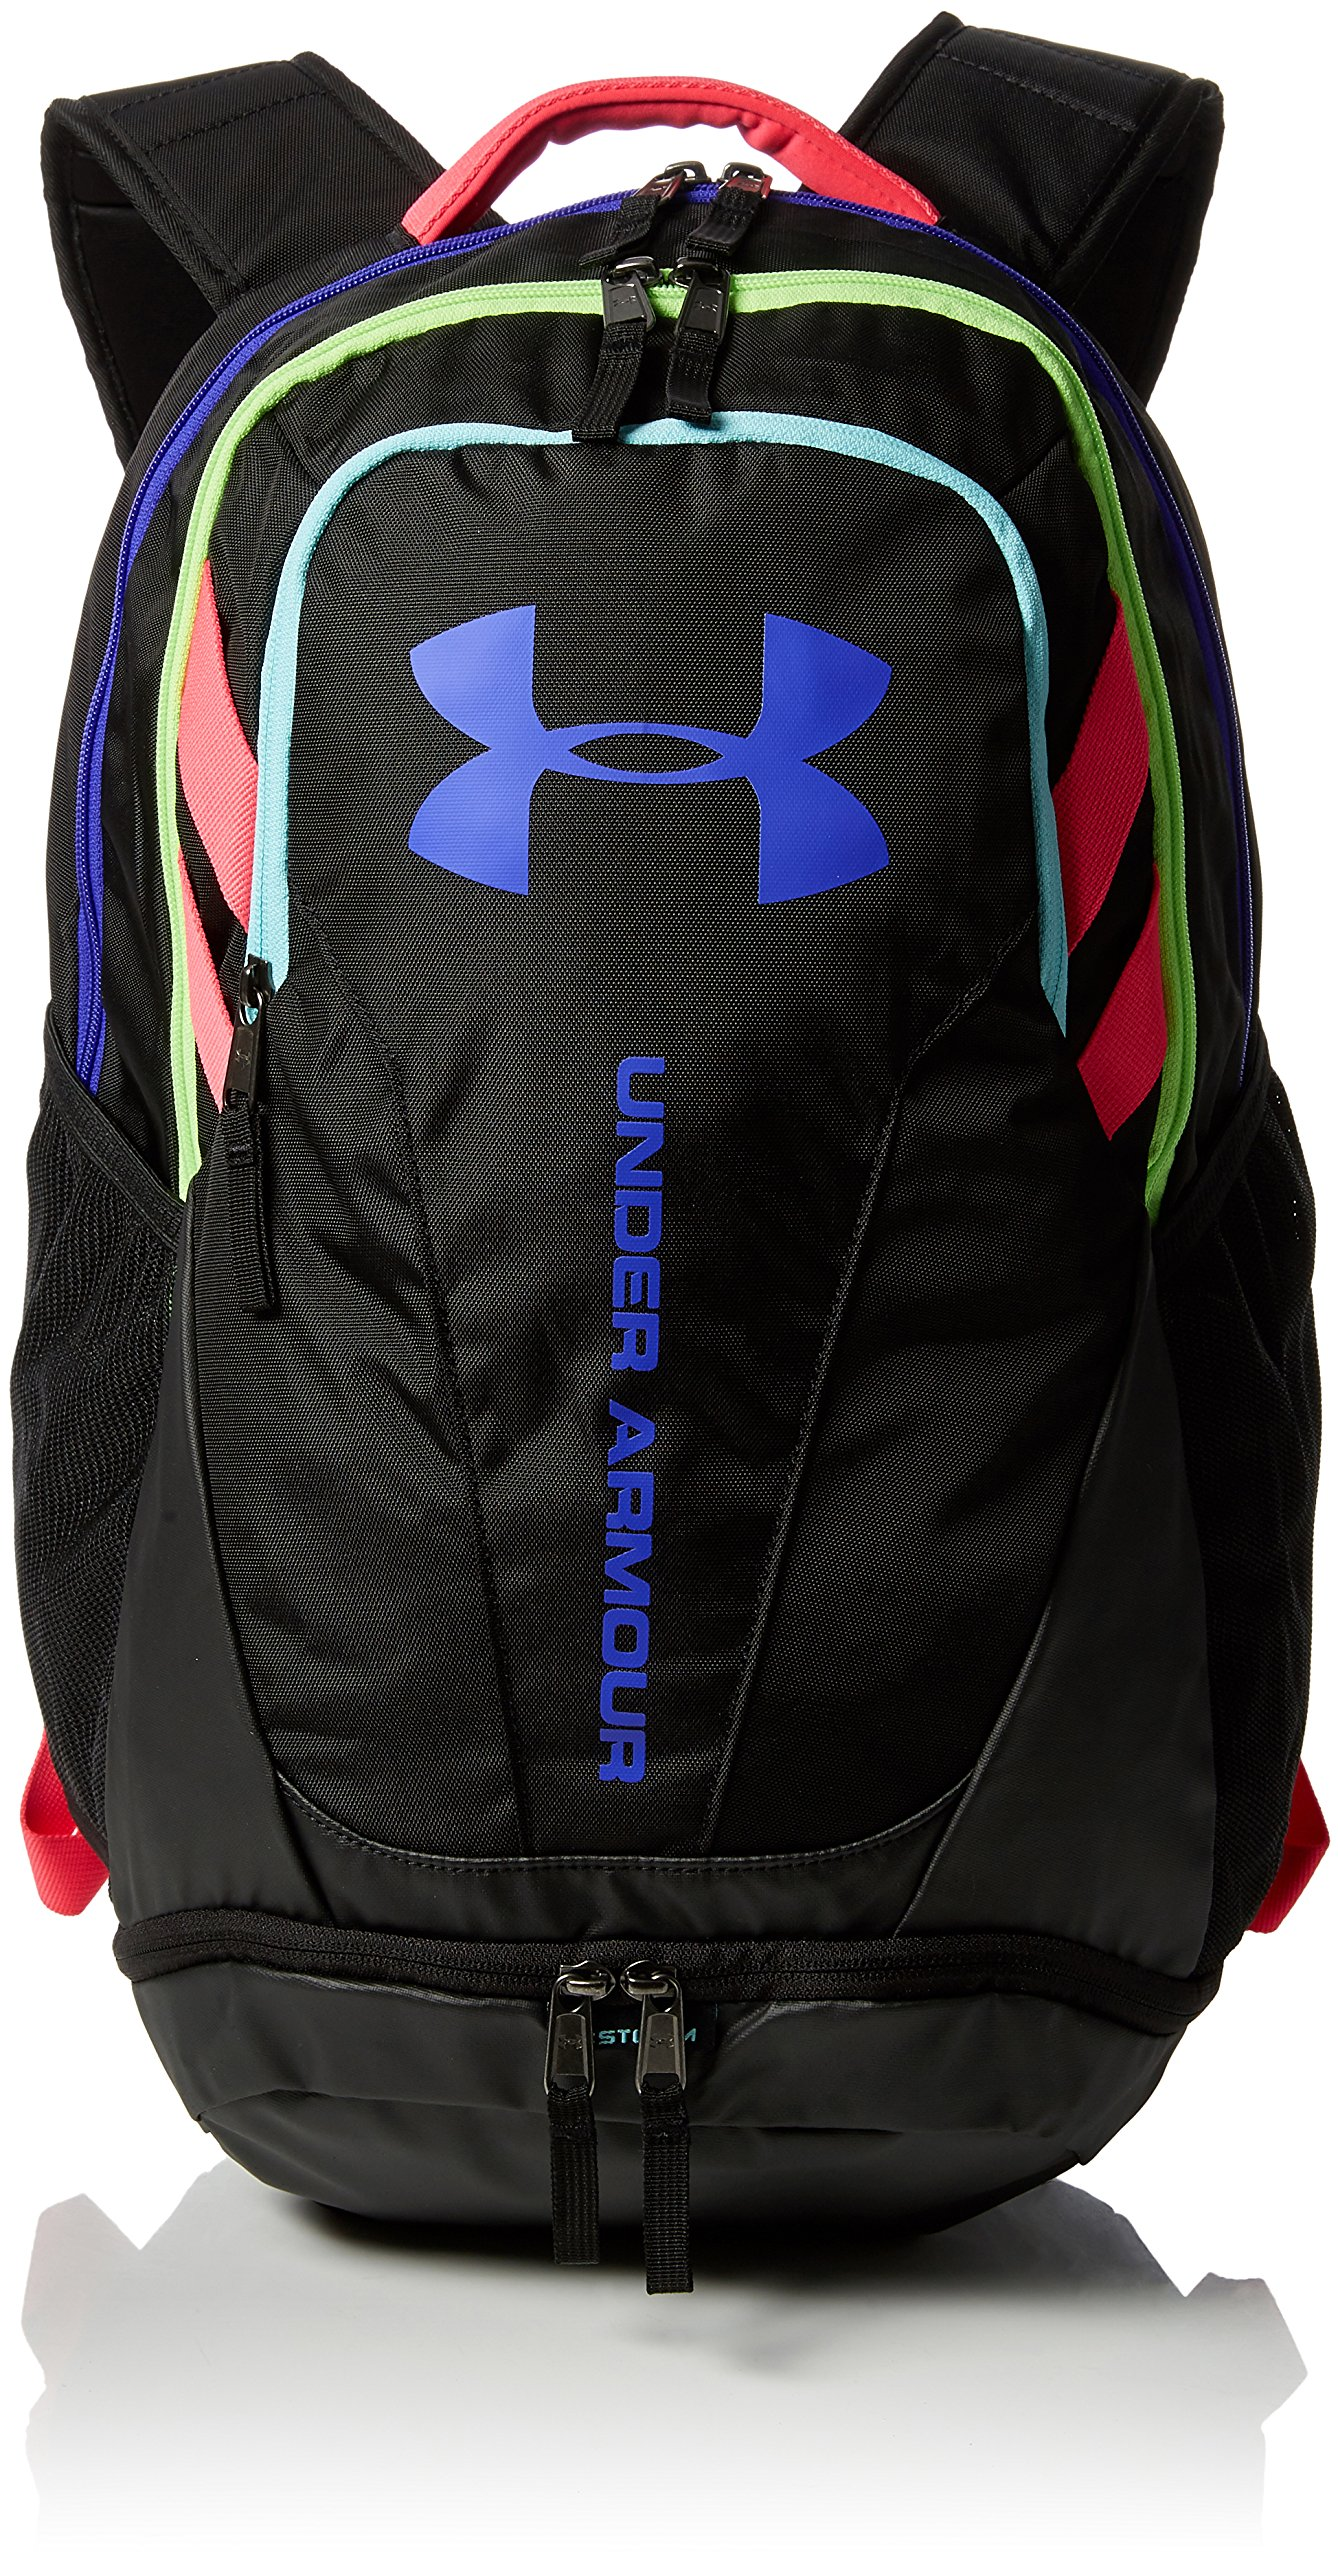 Under Armour Hustle 3.0 Backpack, Black/Black/Constellation Purple, One Size